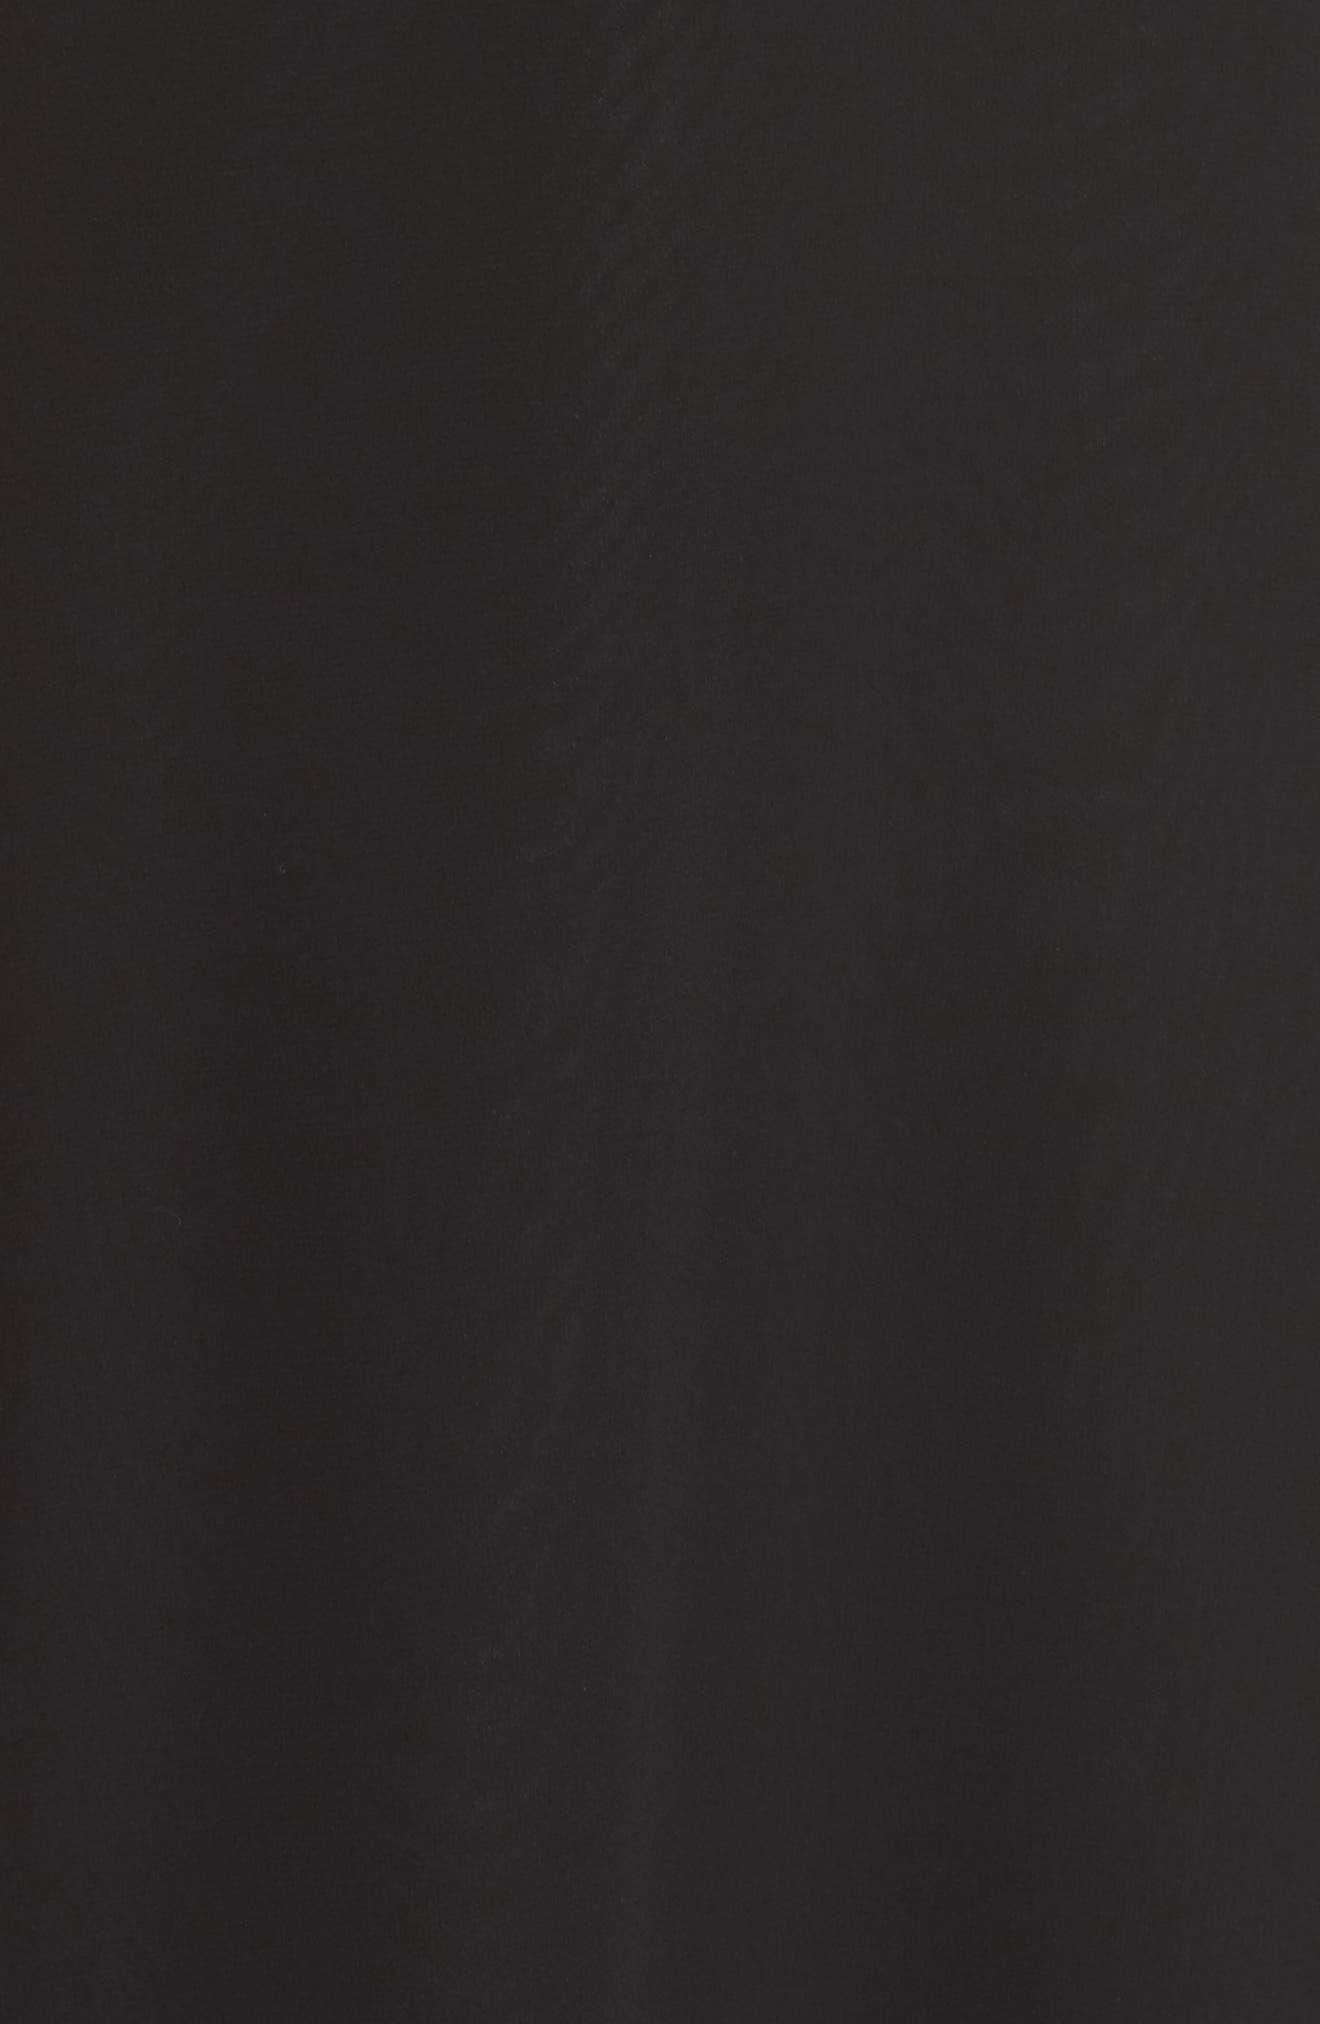 HAYLEY PAIGE OCCASIONS,                             Lace Bodice Chiffon Evening Dress,                             Alternate thumbnail 6, color,                             BLACK / BLACK